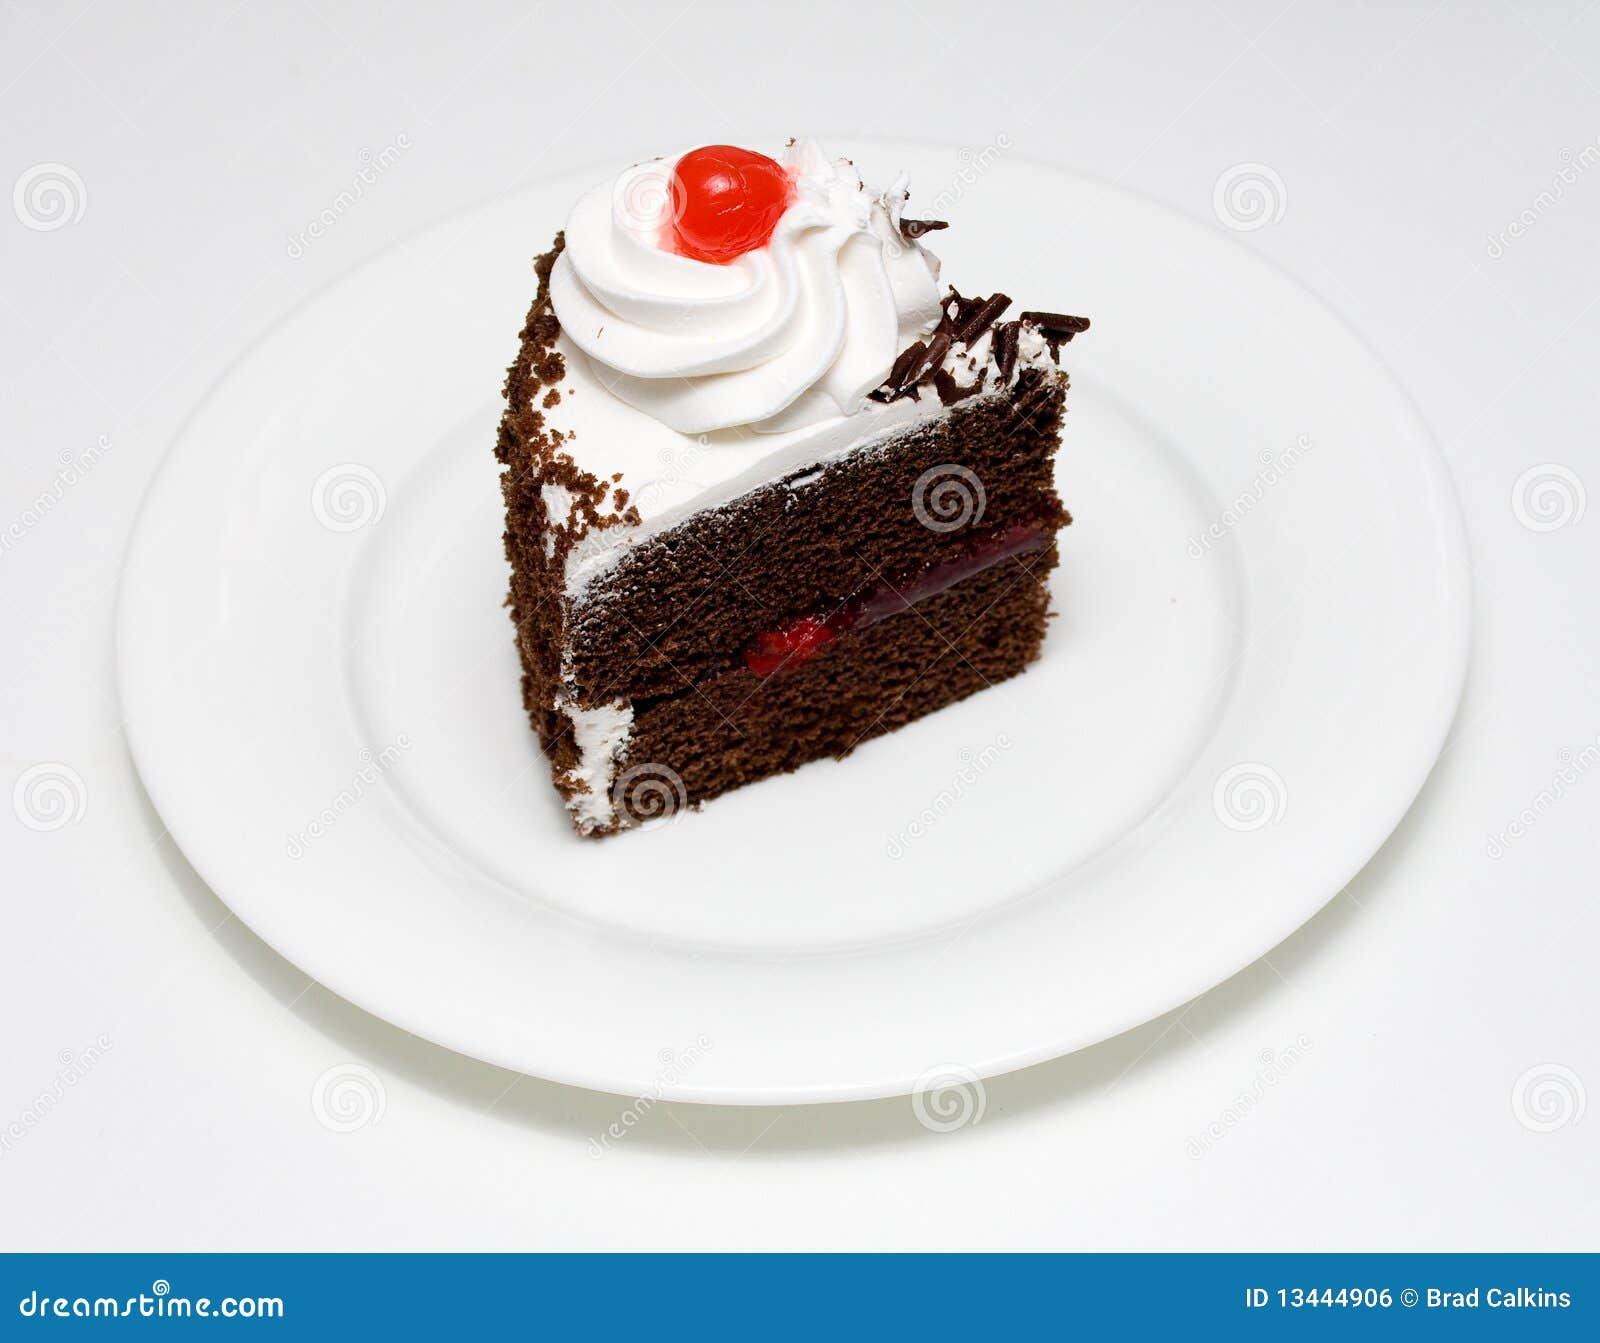 Black Forest Cake Royalty Free Stock Image - Image: 13444906